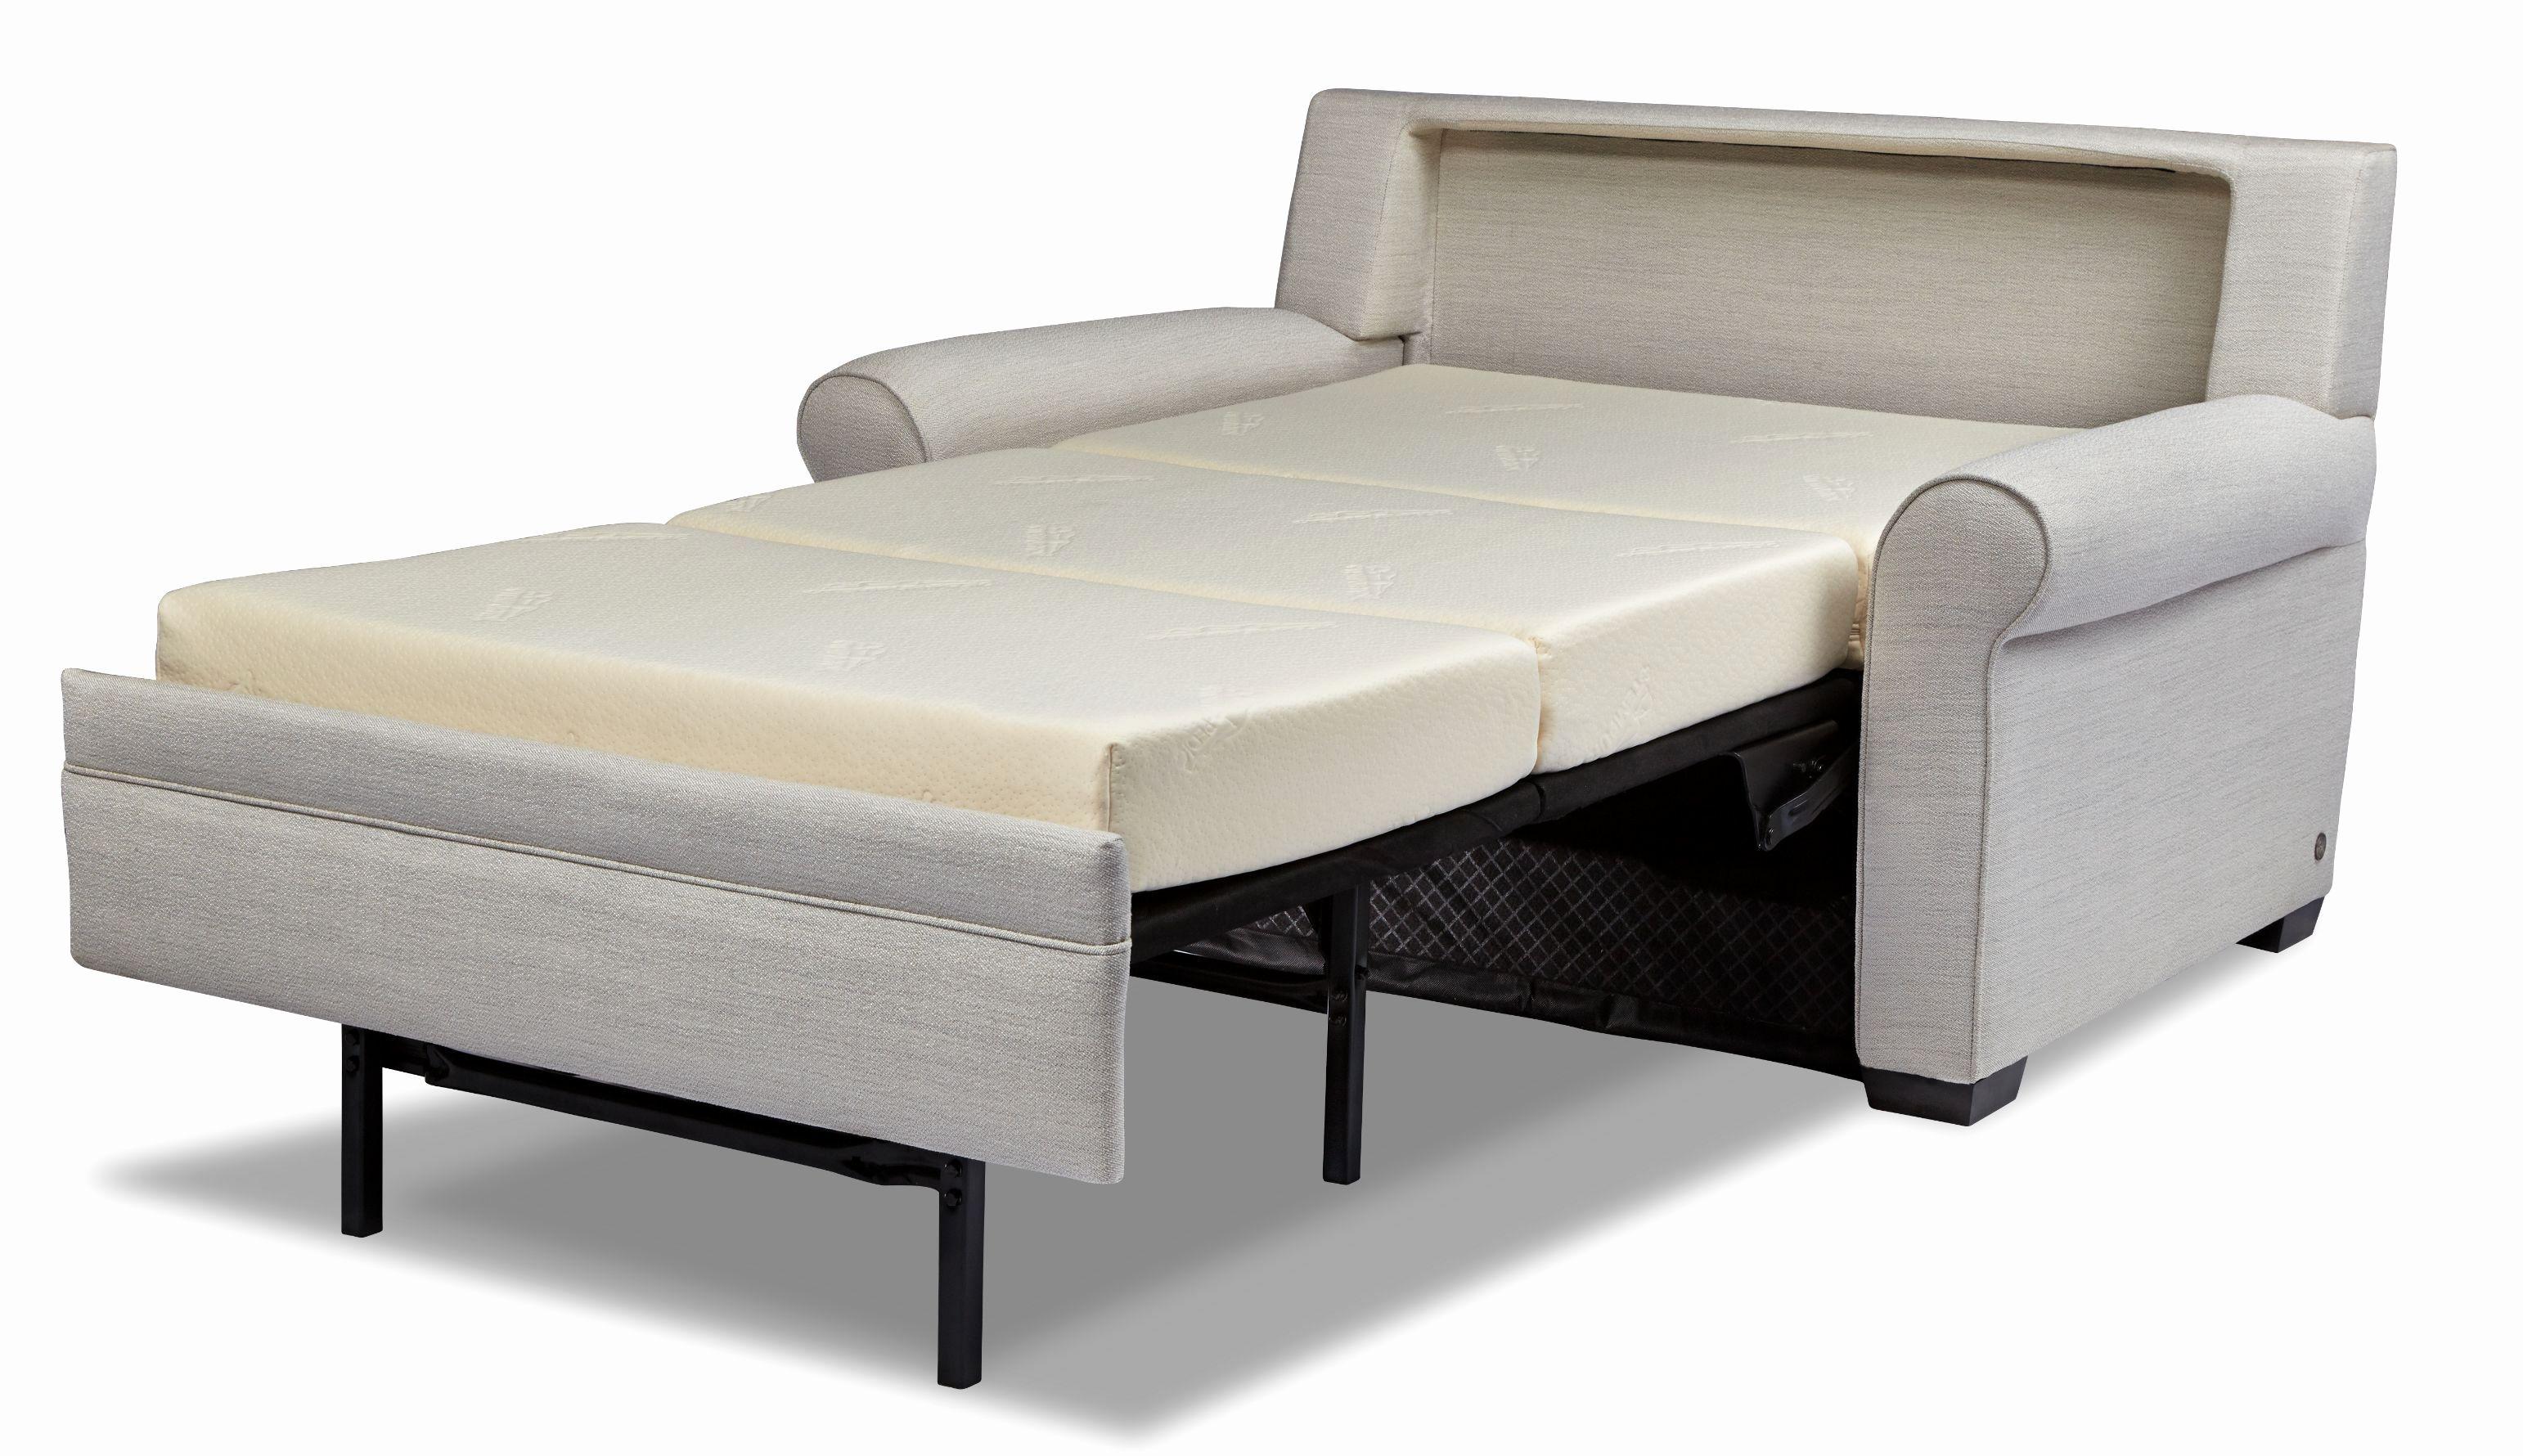 Elegant Comfortable Sleeper Sofas Pics Comfortable Sleeper Sofas